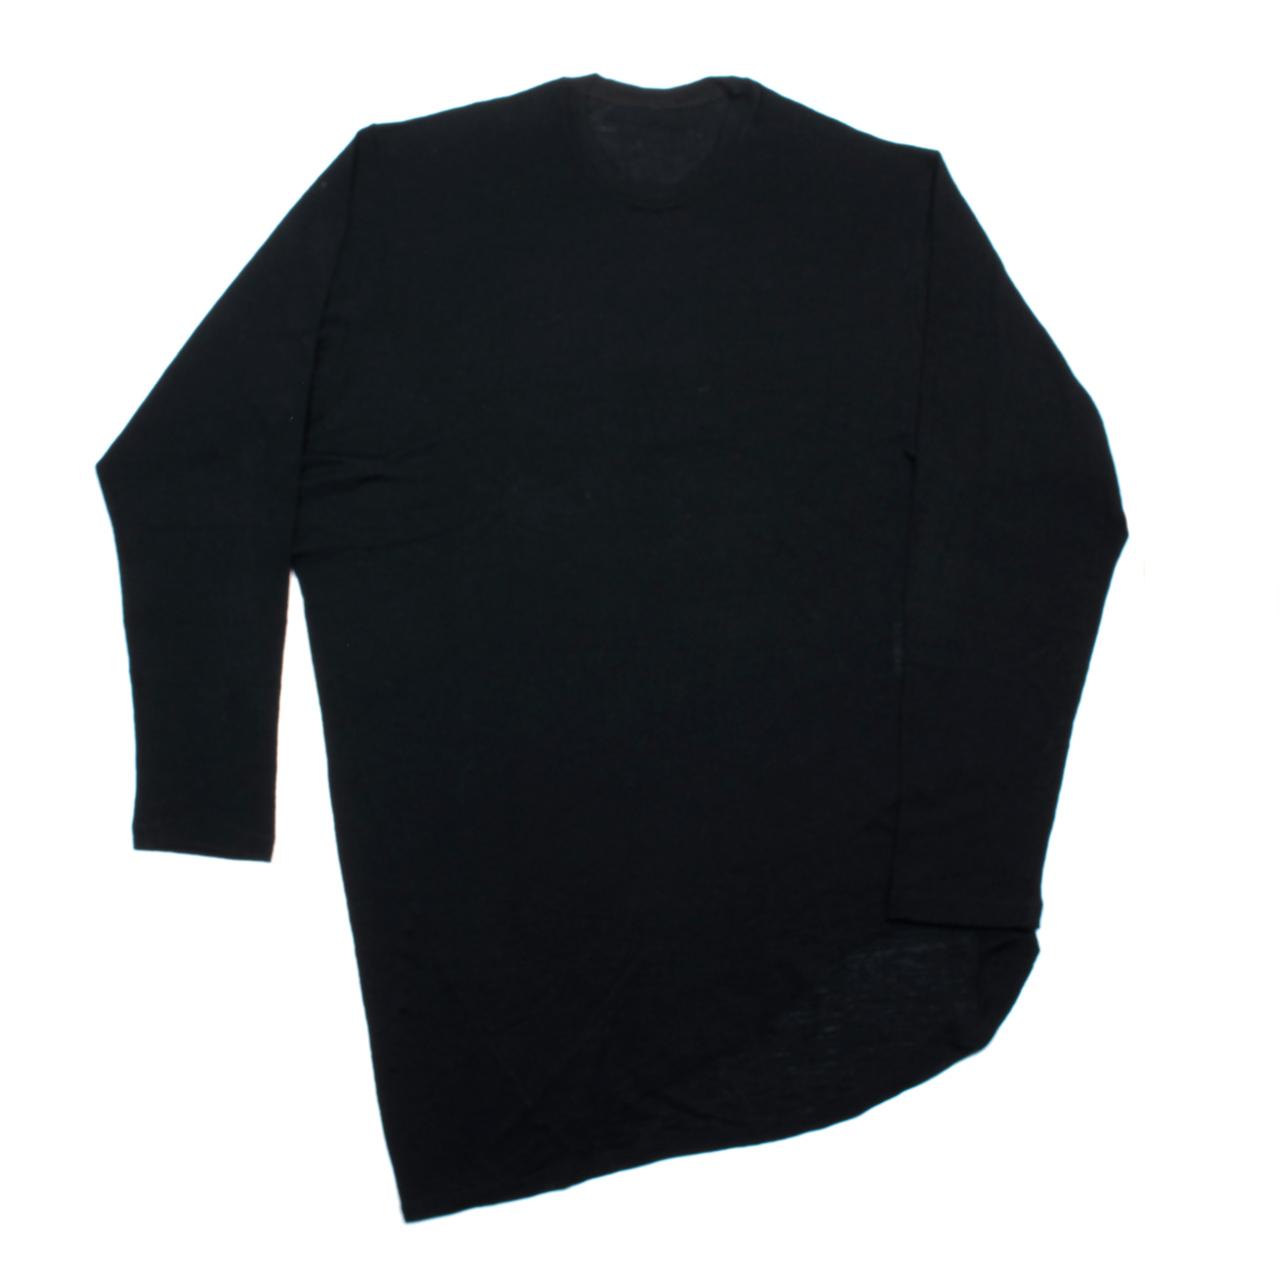 717KNM9-BLACK / ウールロングスリーブTシャツ